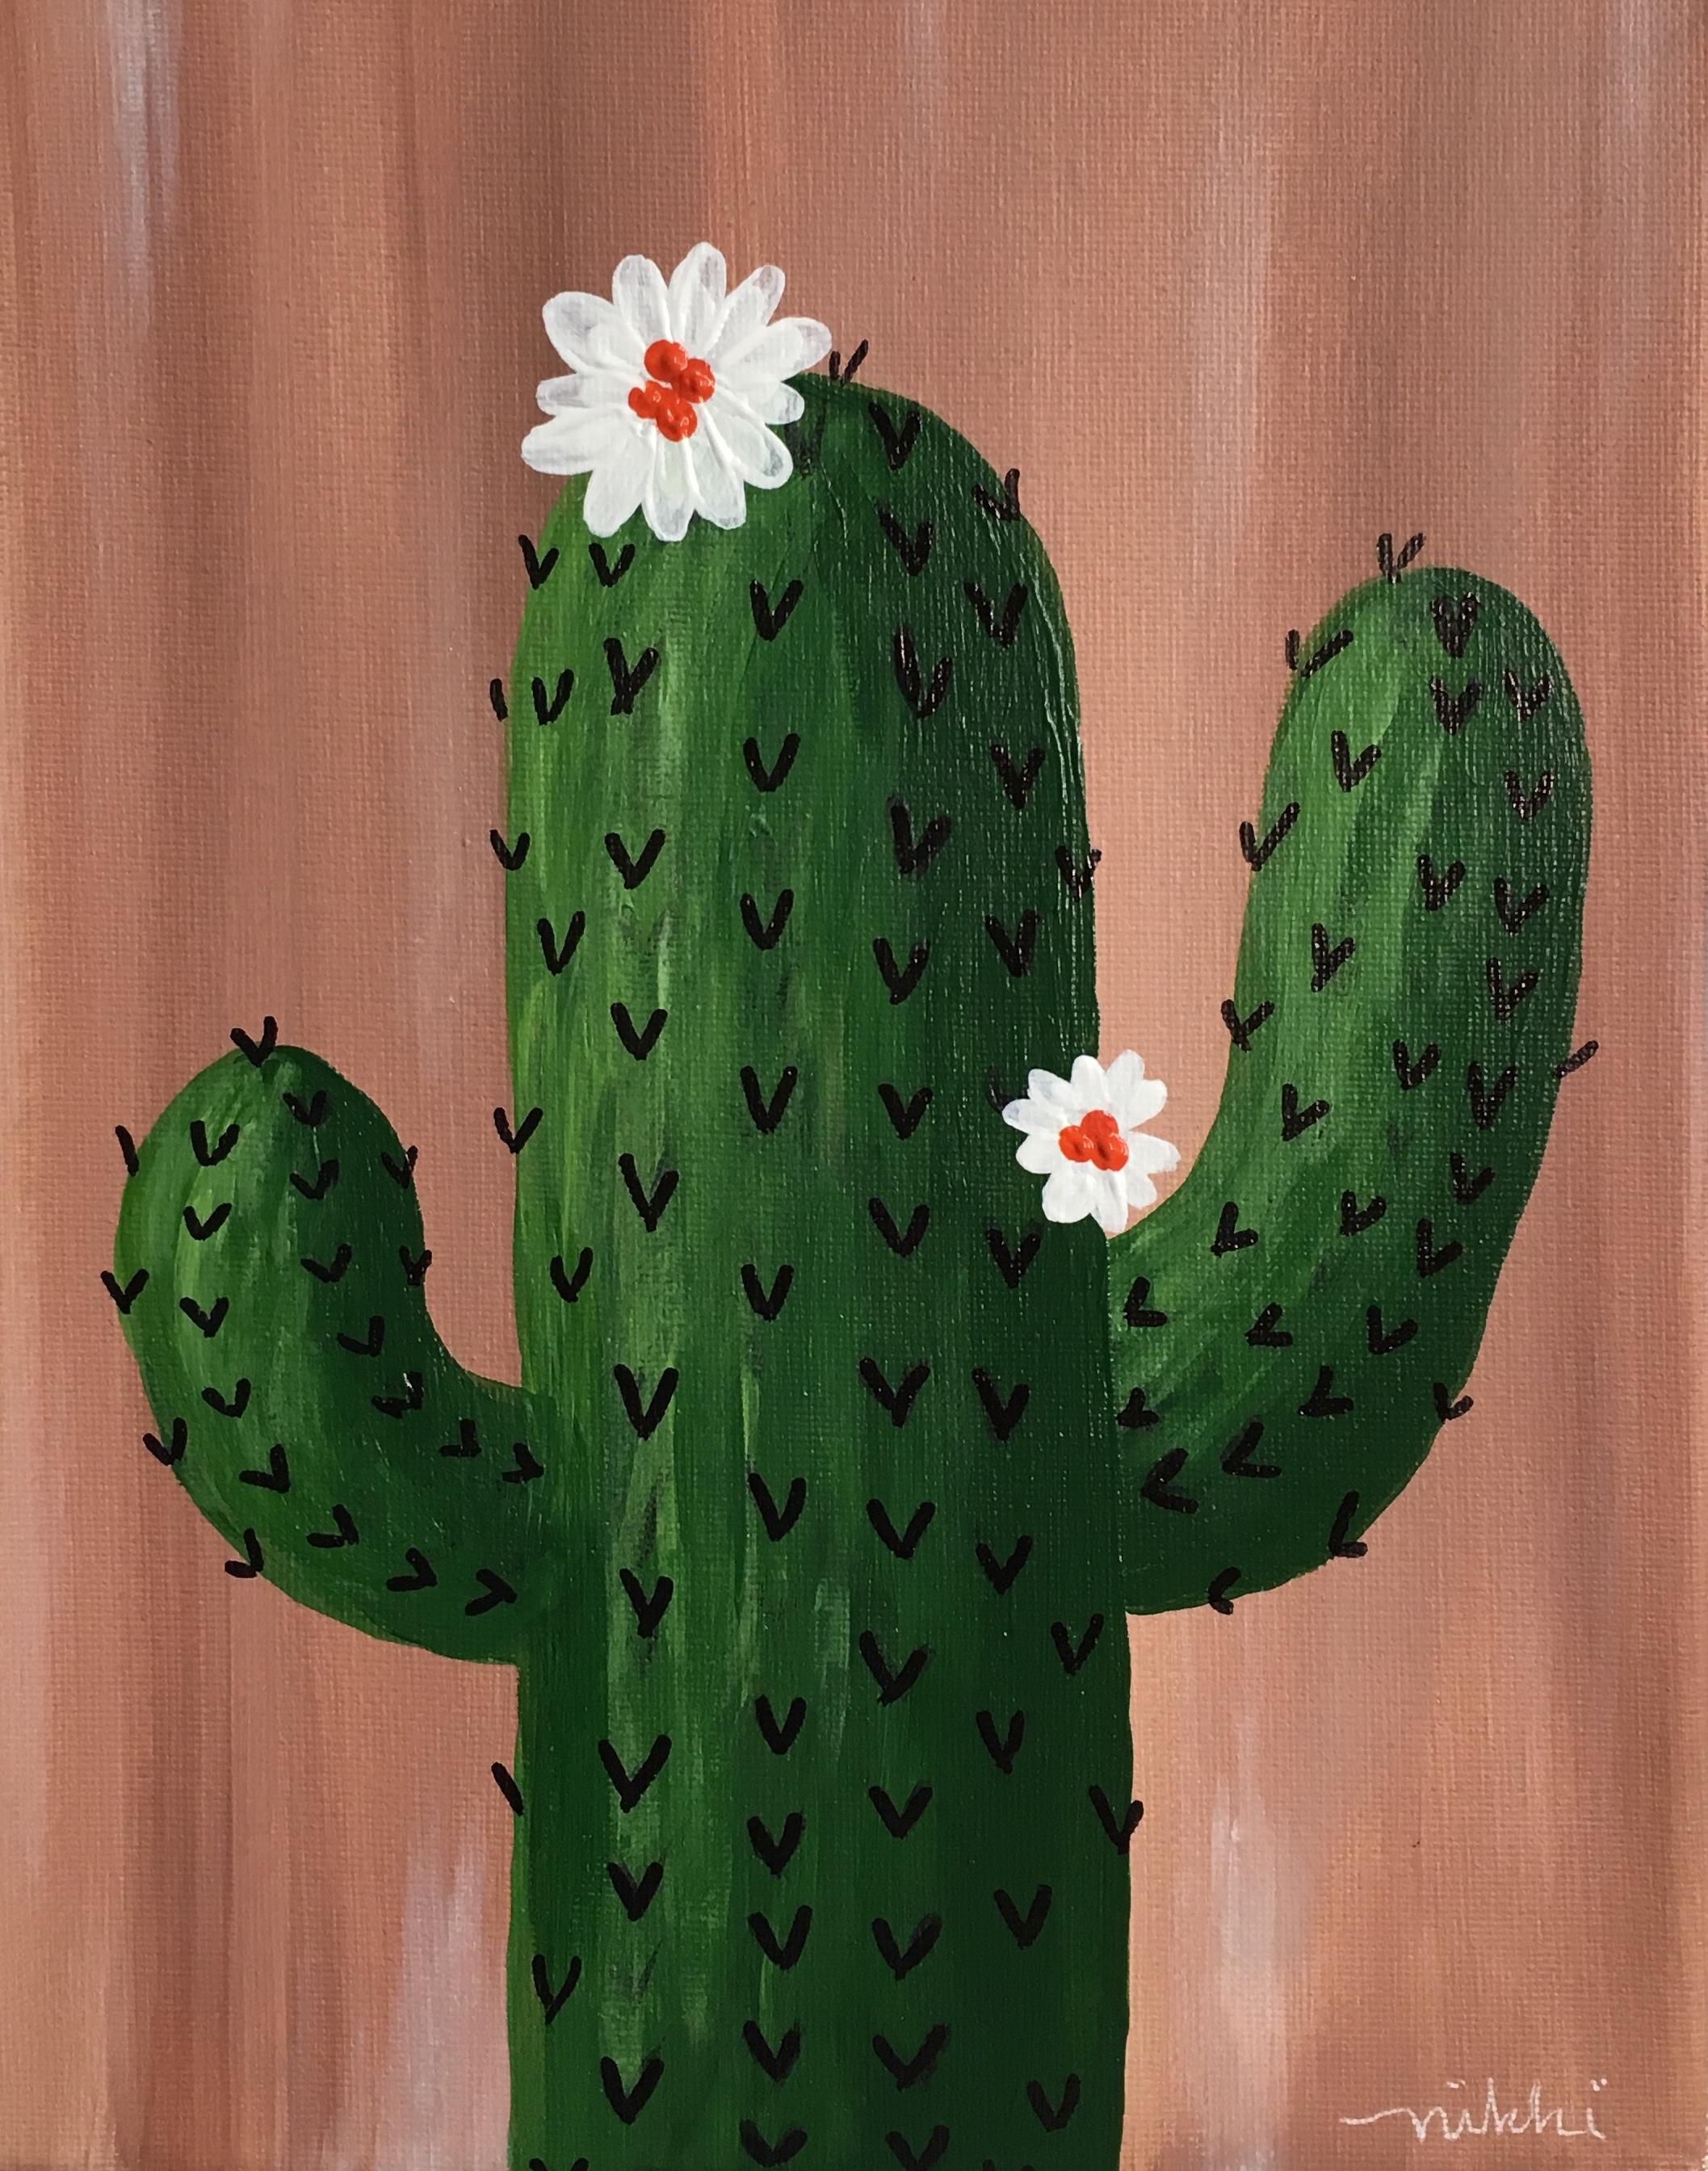 Sunny Saguaro